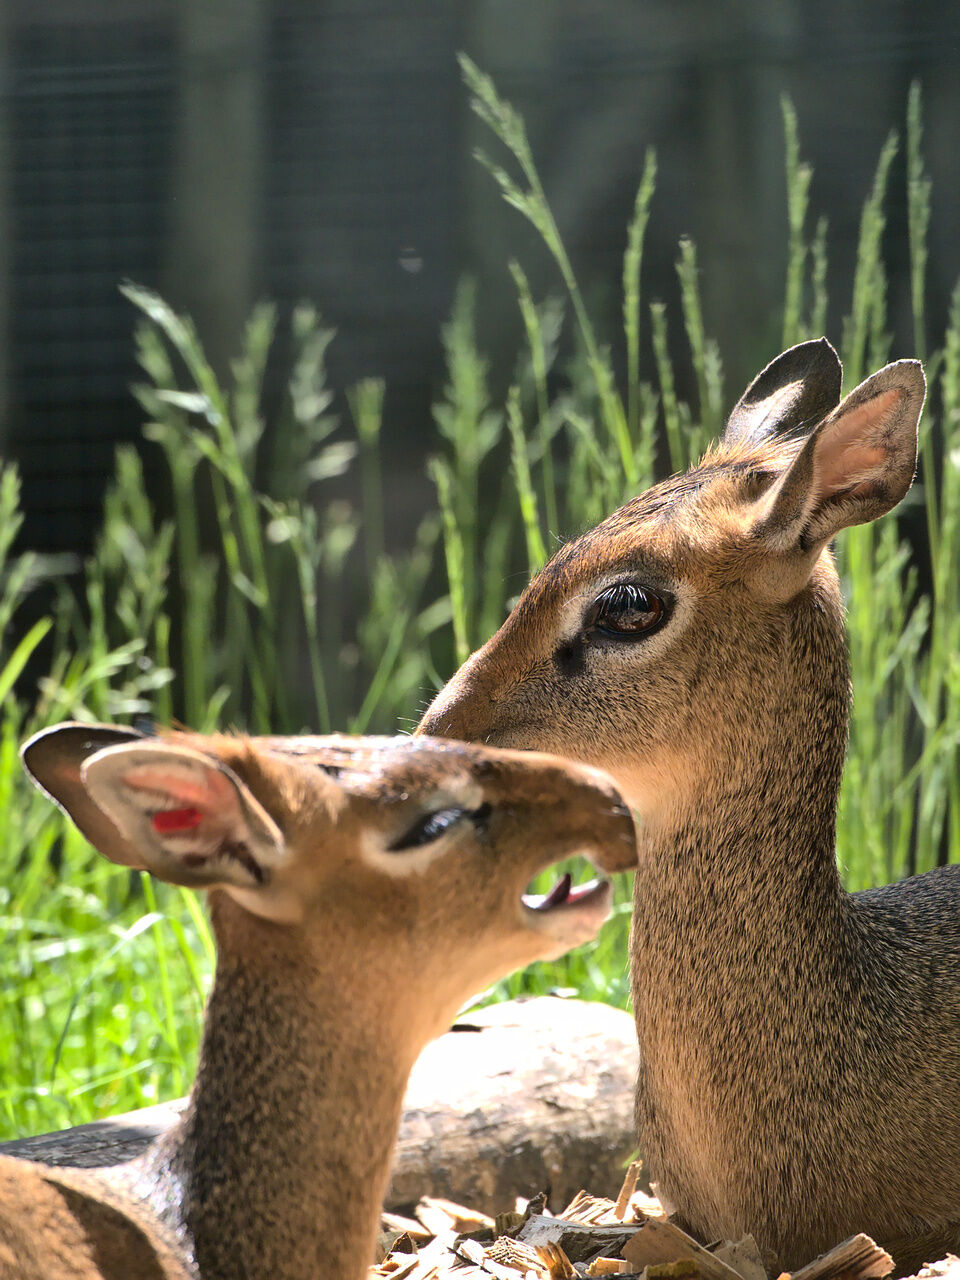 20200524_Zoo_Landau_052